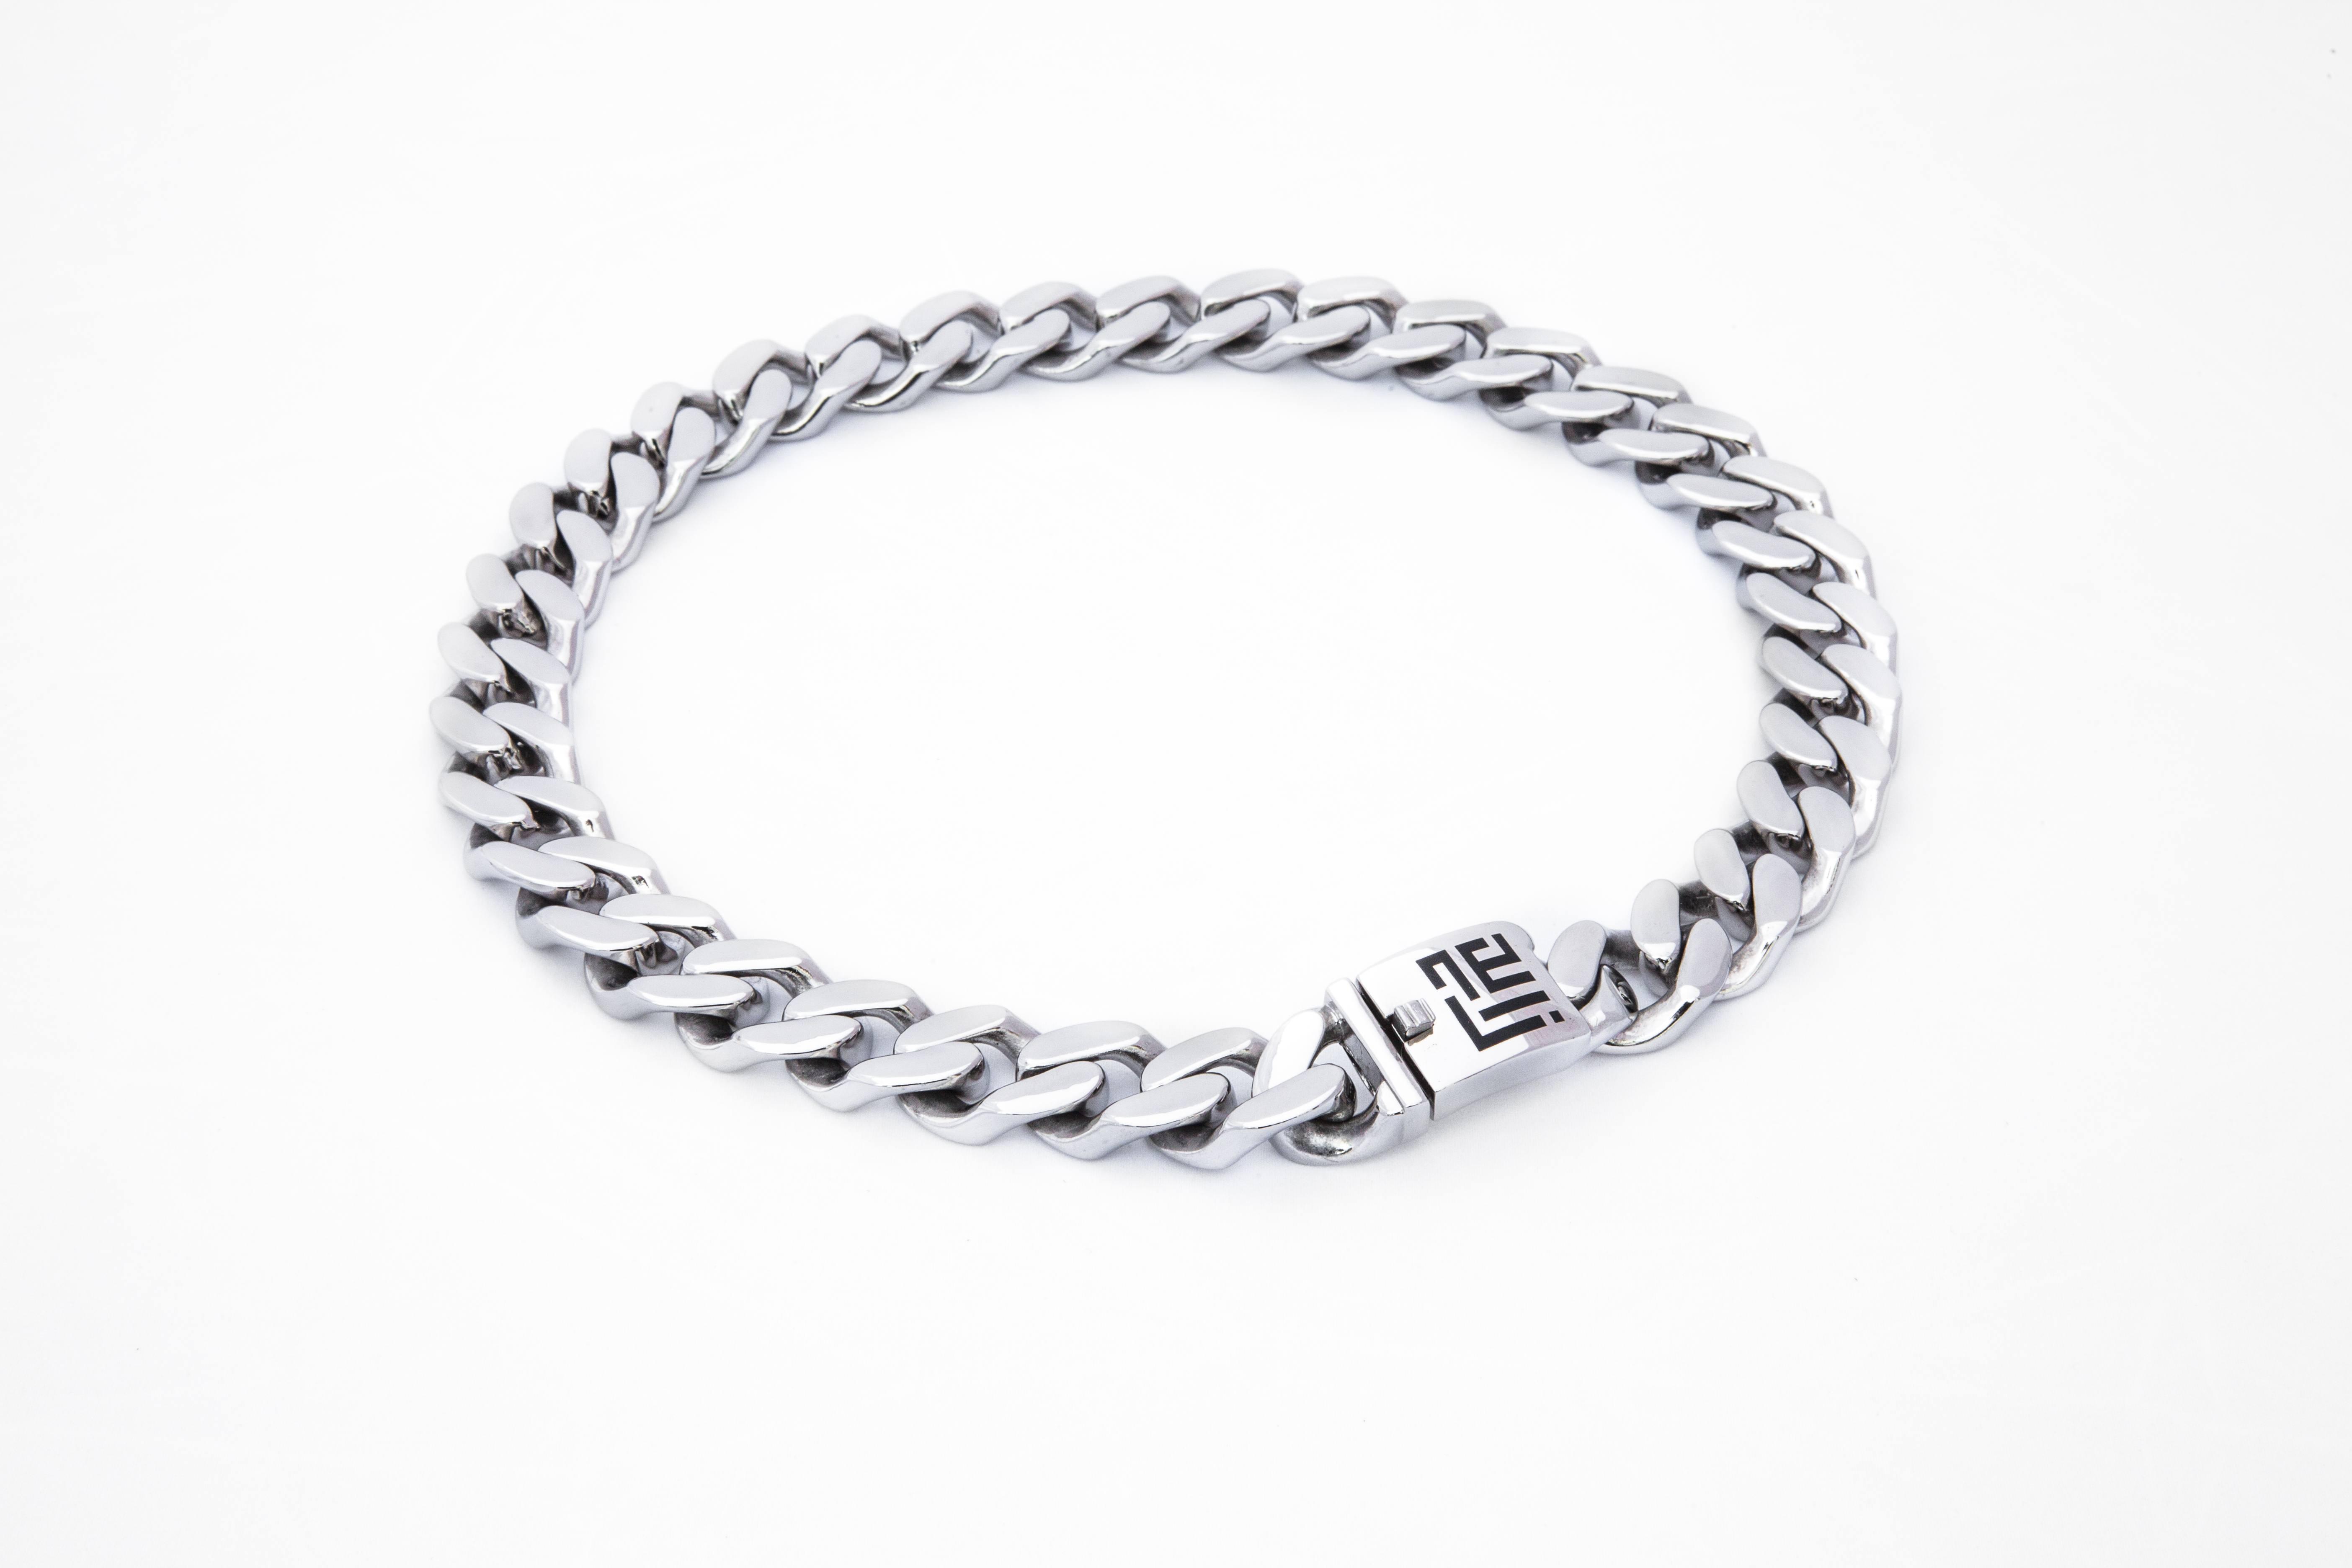 zlc-necklace-zlcopenhagen